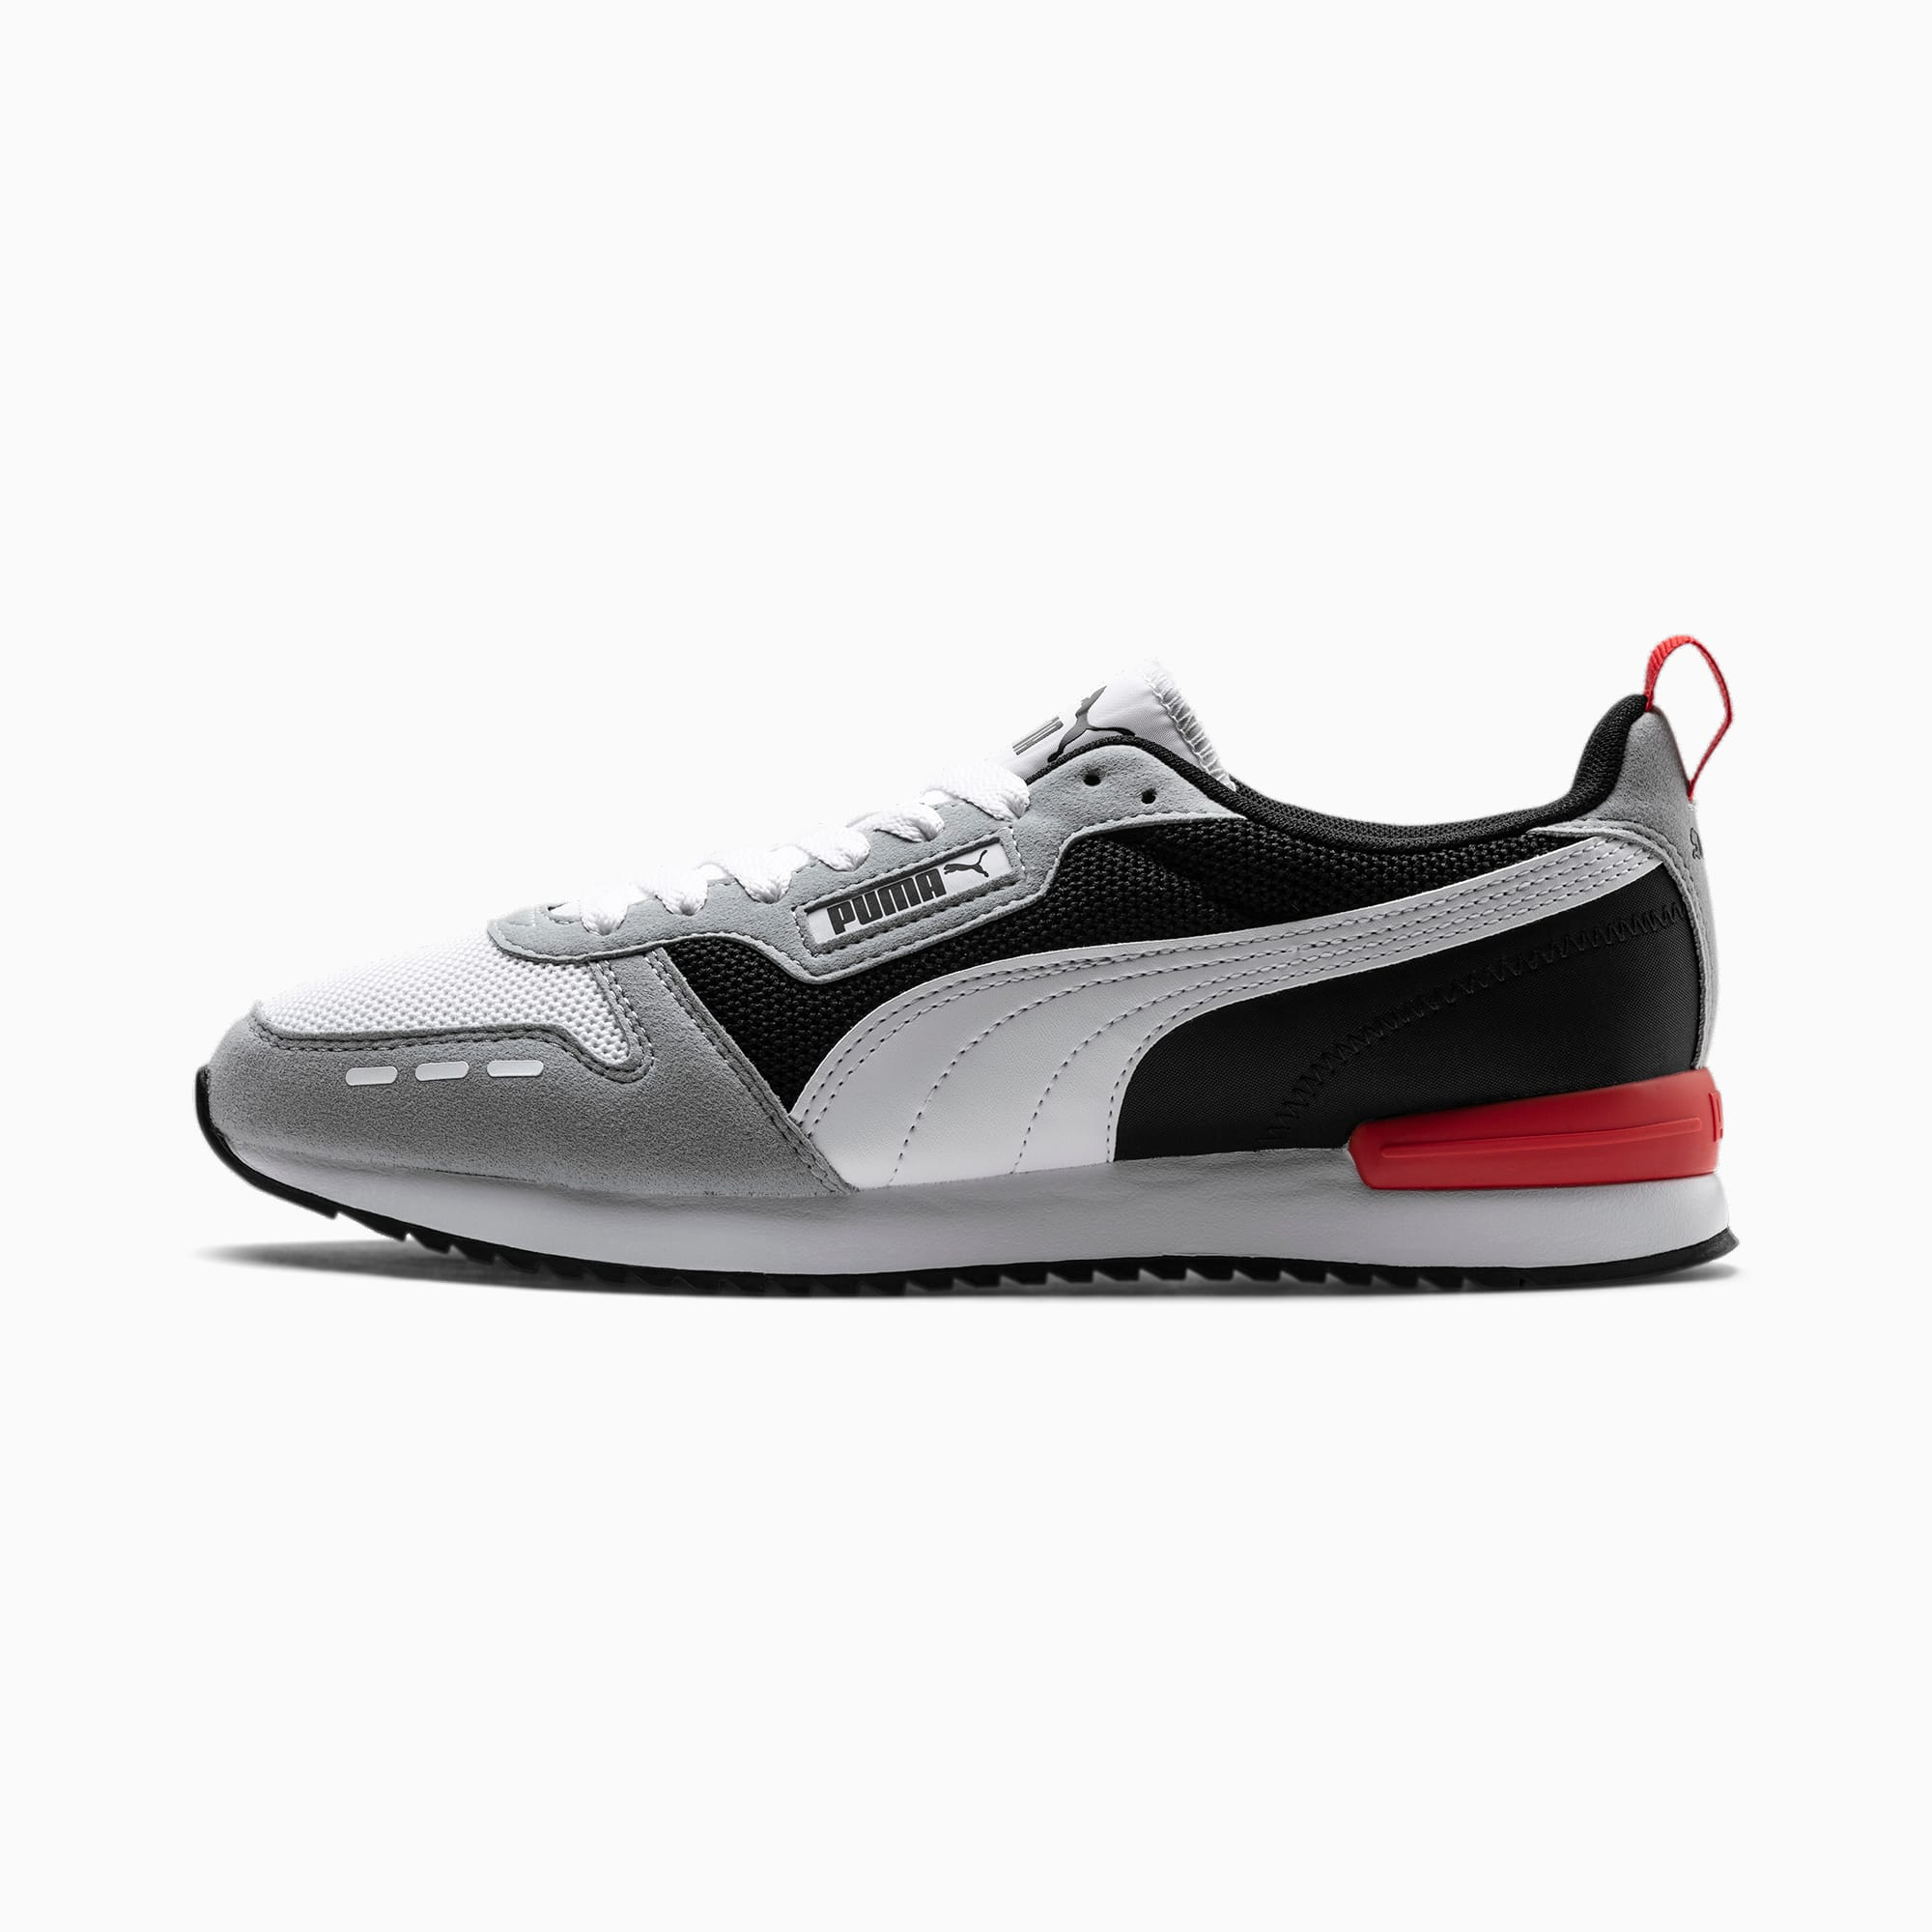 puma R78 Runner sportschoenen, Zwart/Grijs/Wit42,5